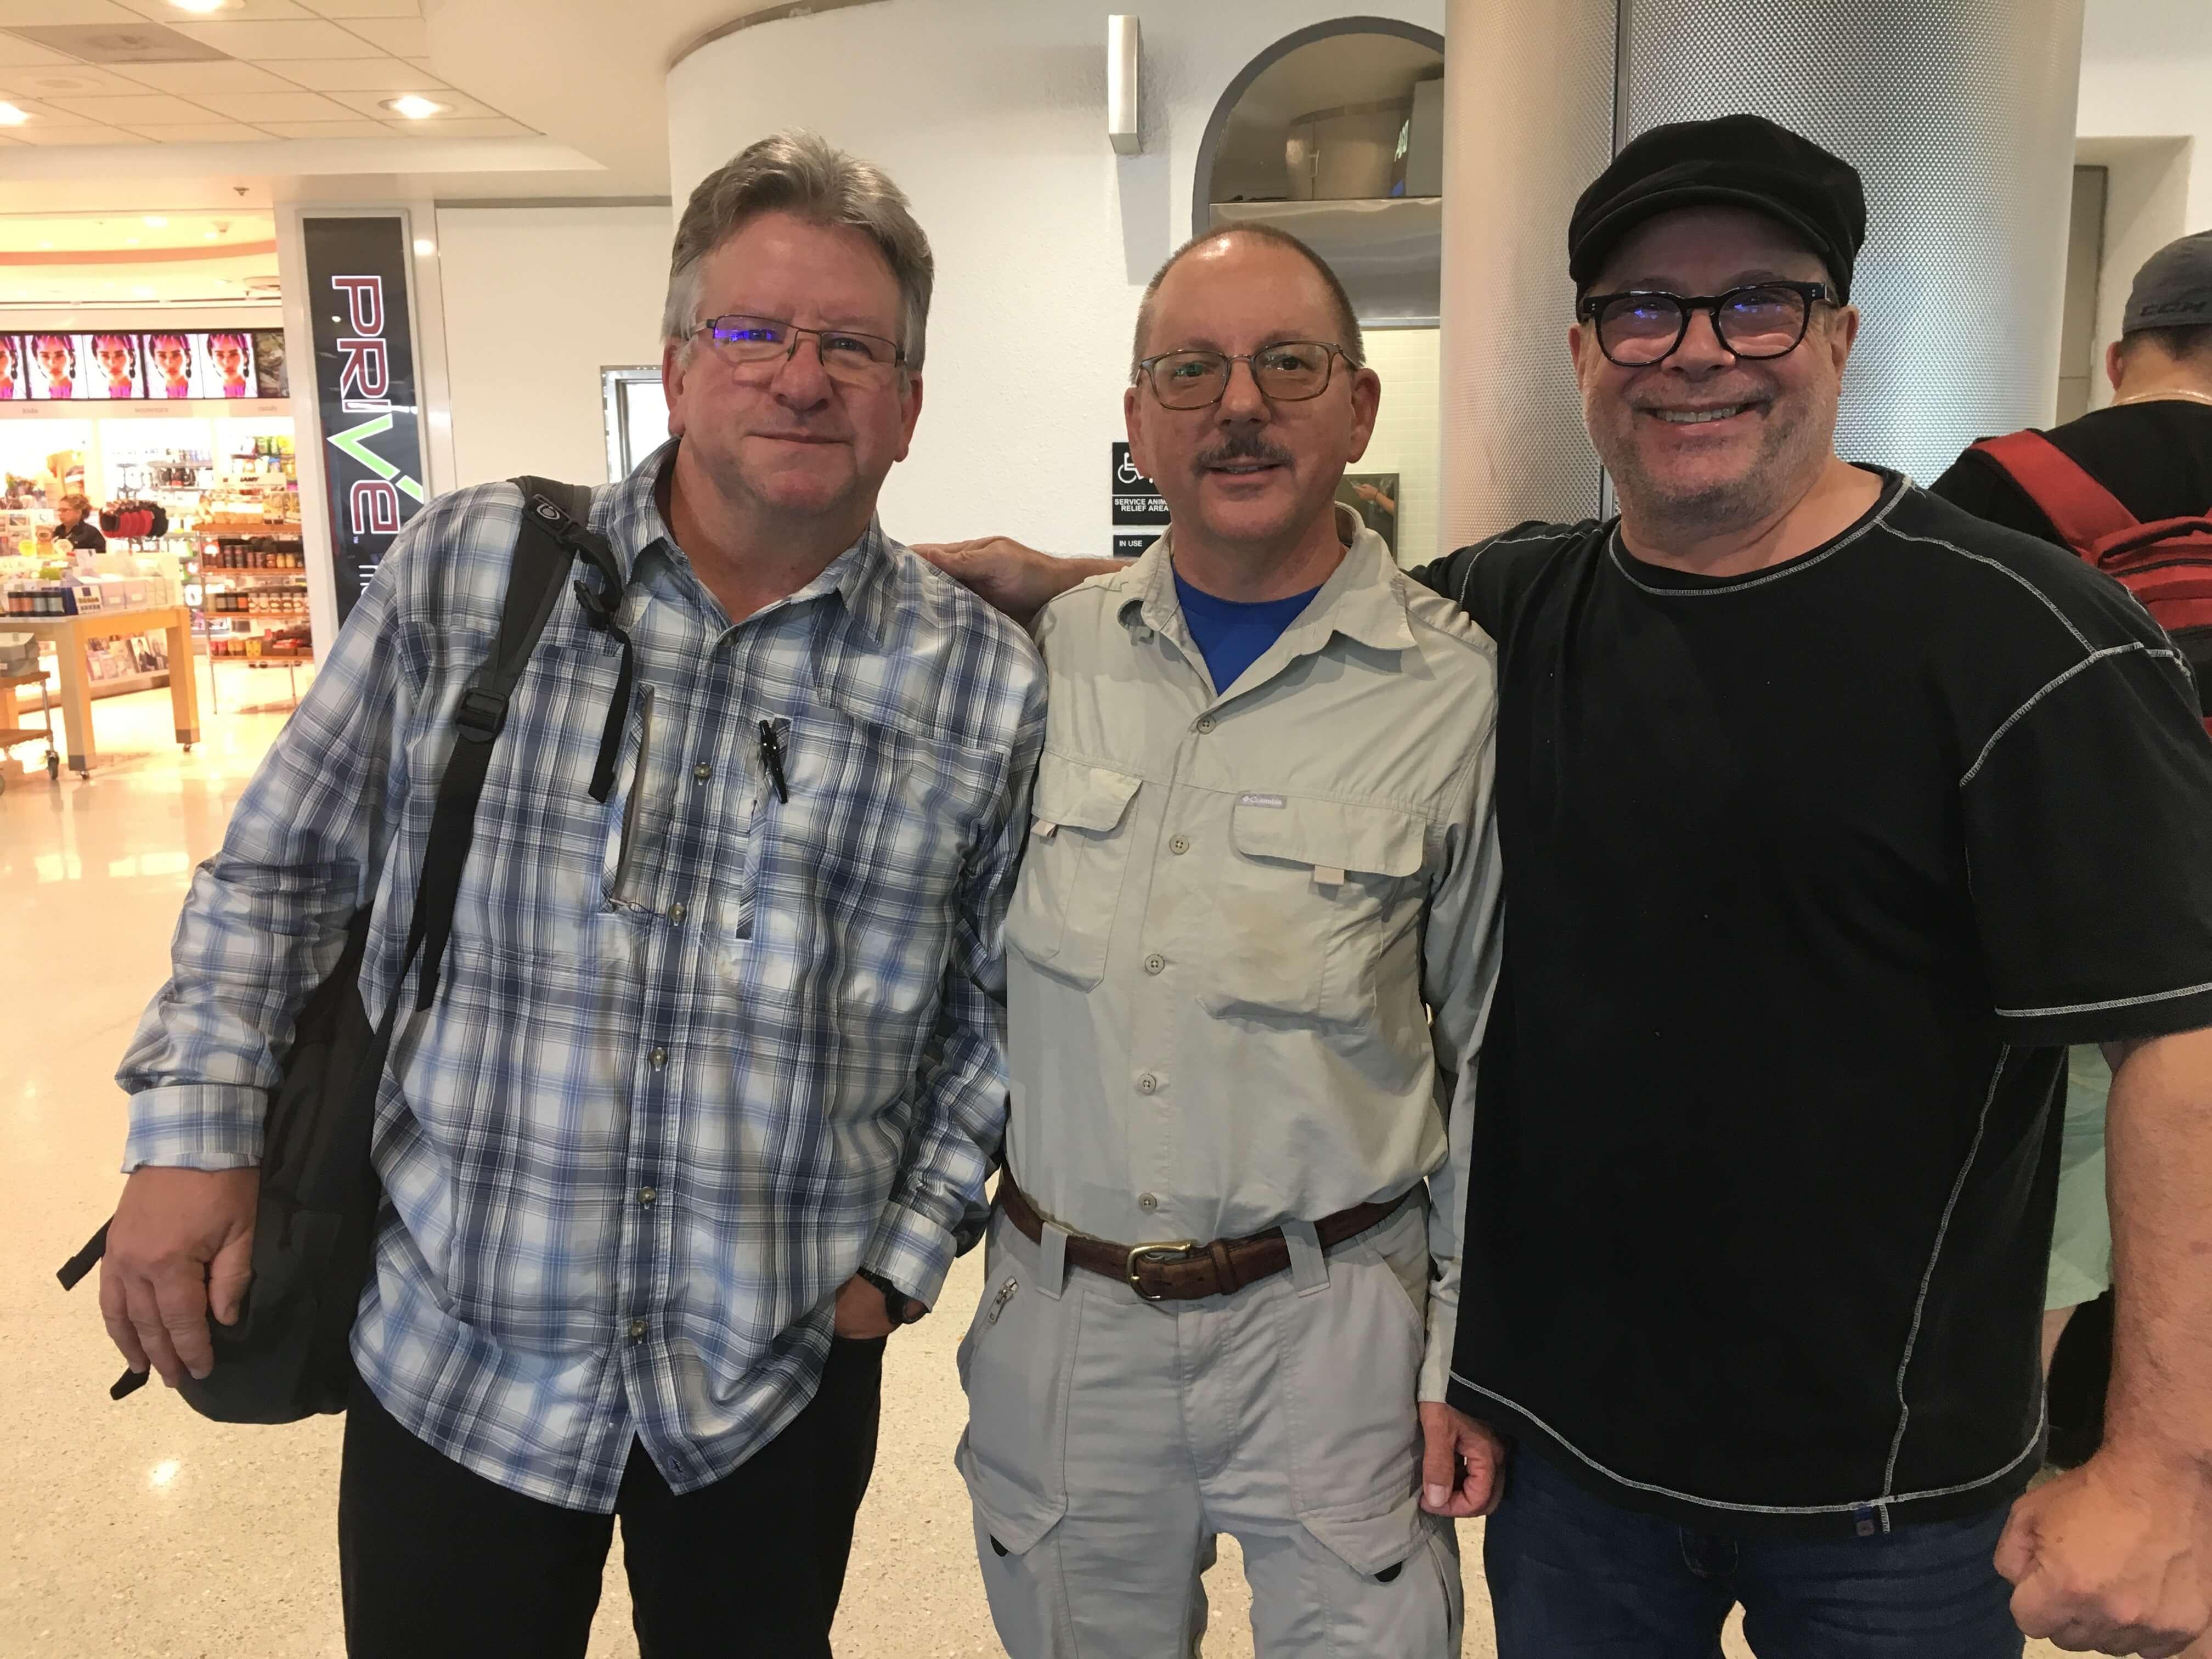 Gerry Kirkpatrick, David Gratson, and Rock Vitale at Amazon Fishing Trip